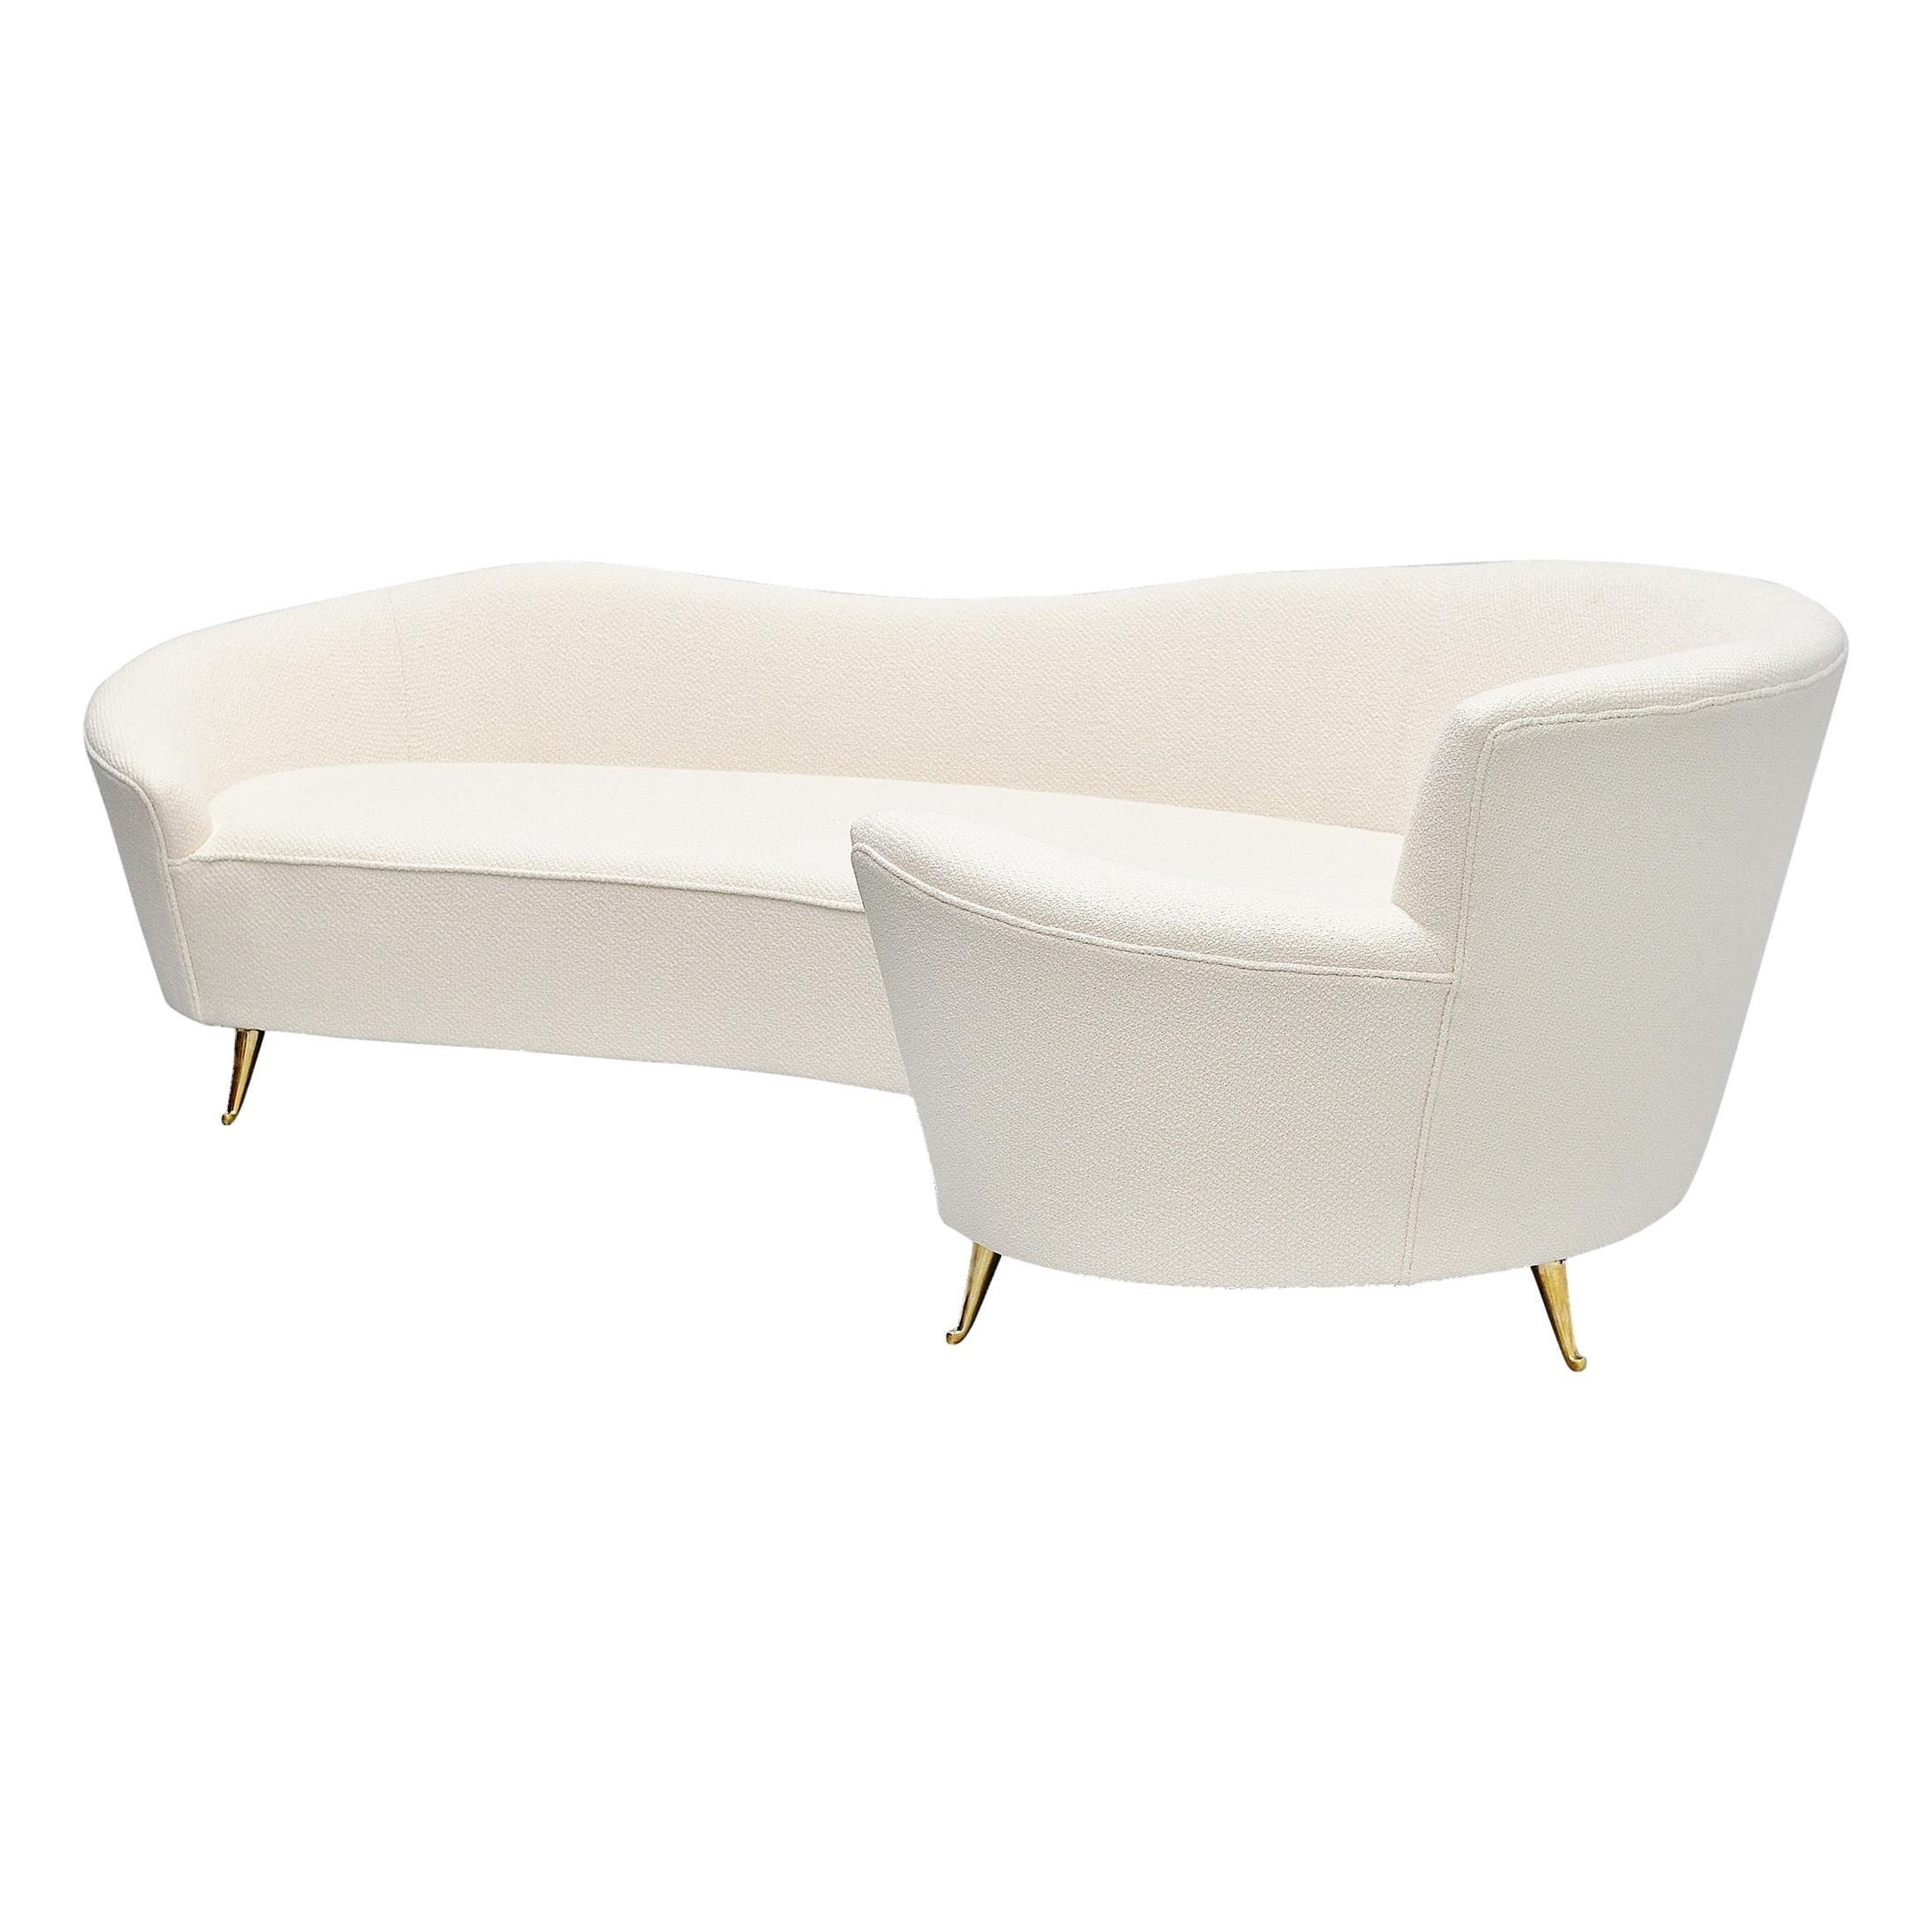 Federico Munari Curved Lounge Sofa, Italy, 1960